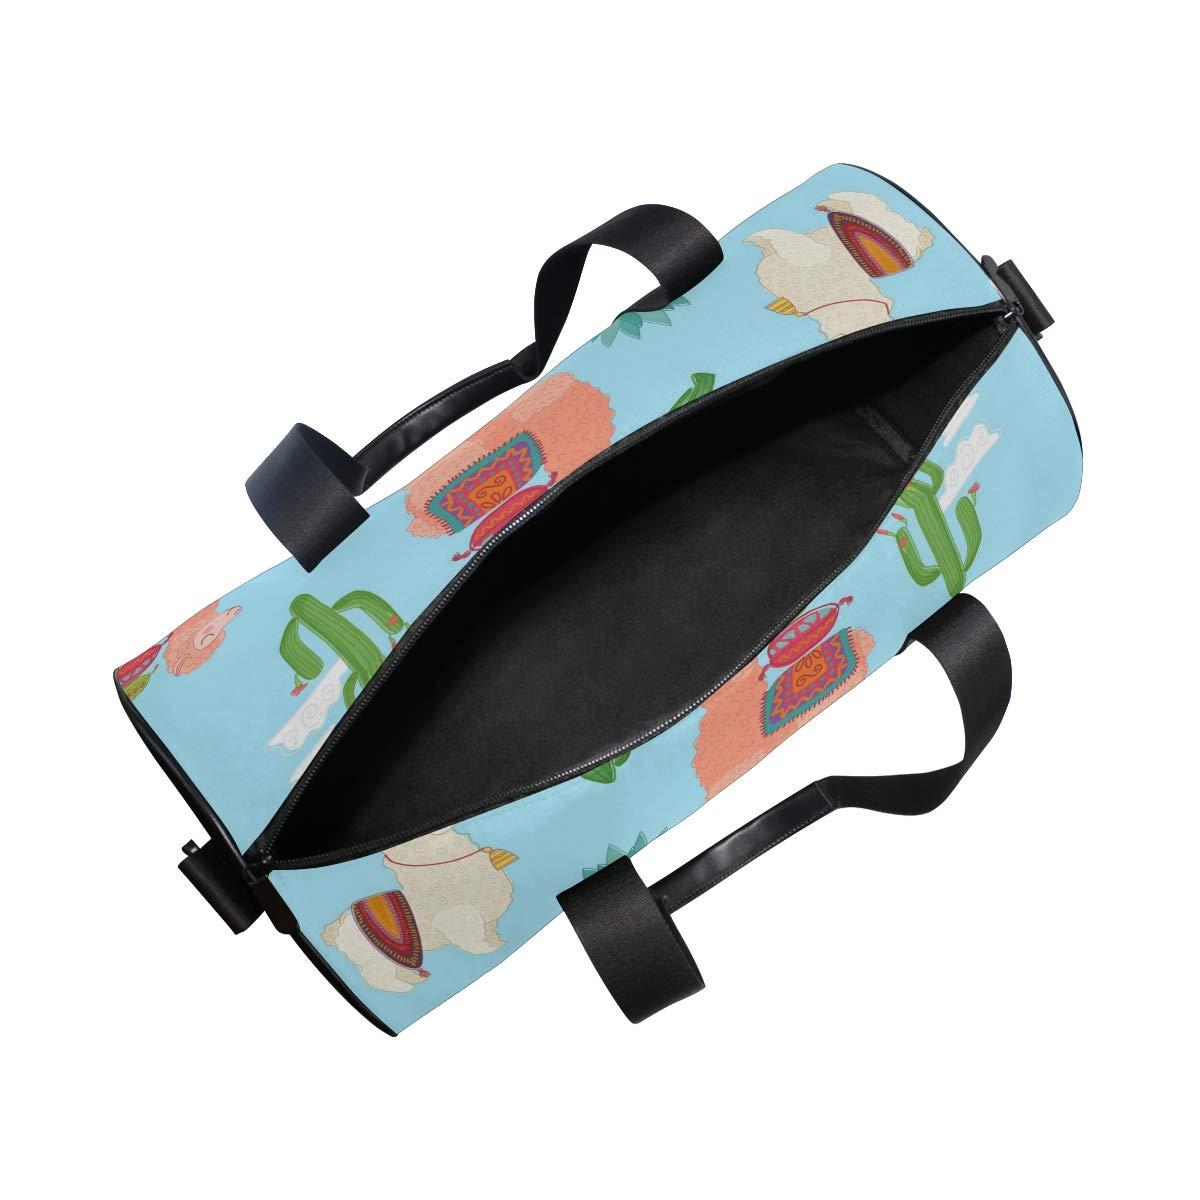 Llama Unisex's Duffel Bag Travel Tote Luggage Bag Gym Sports Luggage Bag by EVERUI (Image #5)